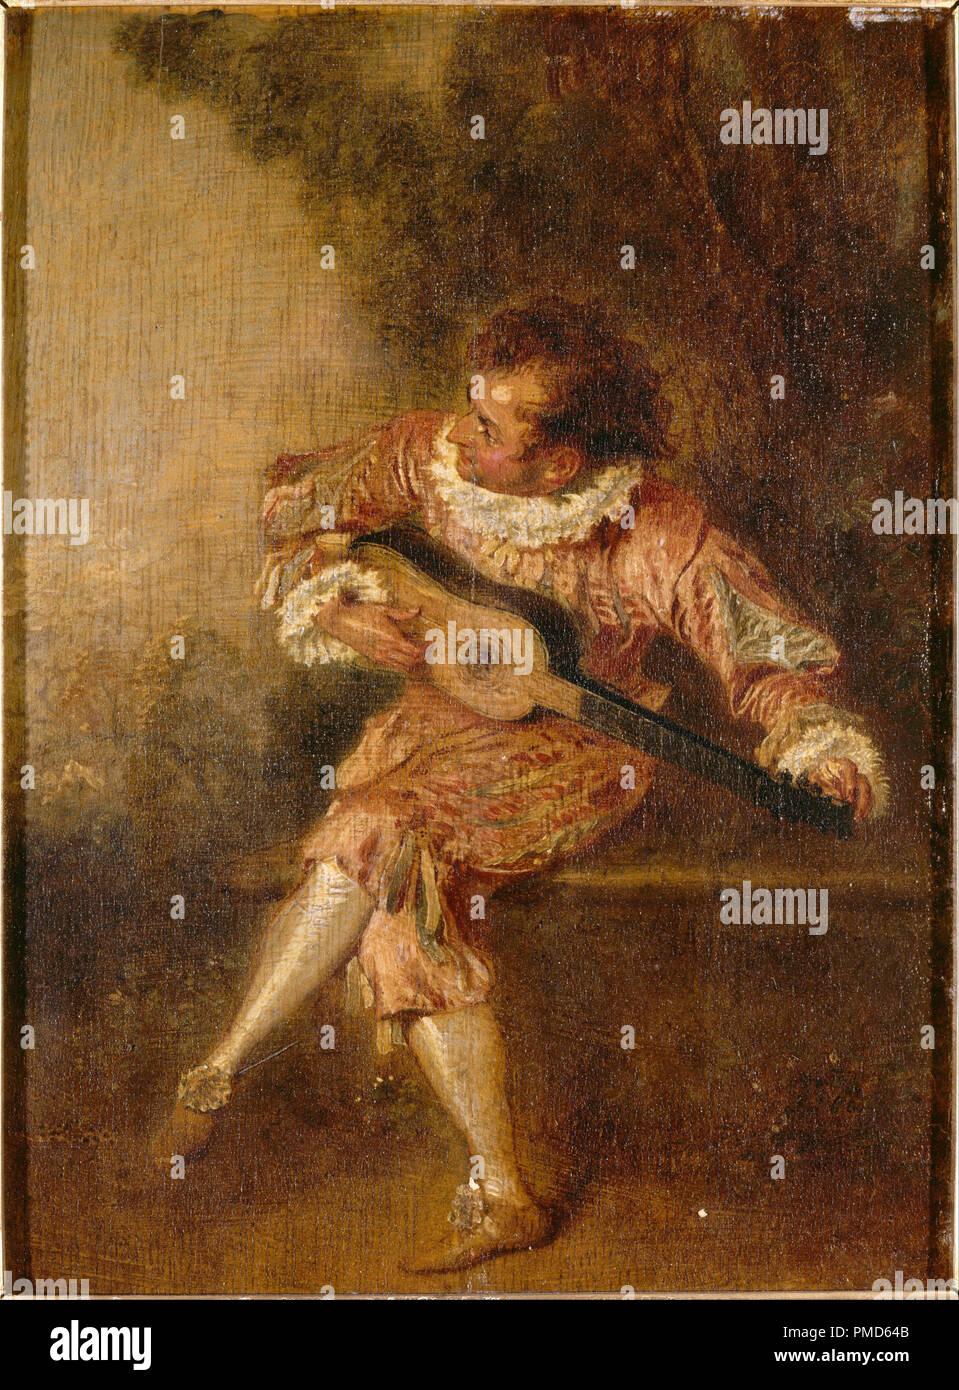 Le donneur de sérénades (Mezetin). Date/Period: Ca. 1715. Painting. Oil on panel. Height: 240 mm (9.44 in); Width: 175 mm (6.88 in). Author: ANTOINE WATTEAU. WATTEAU, ANTOINE. Watteau, Jean Antoine. - Stock Image